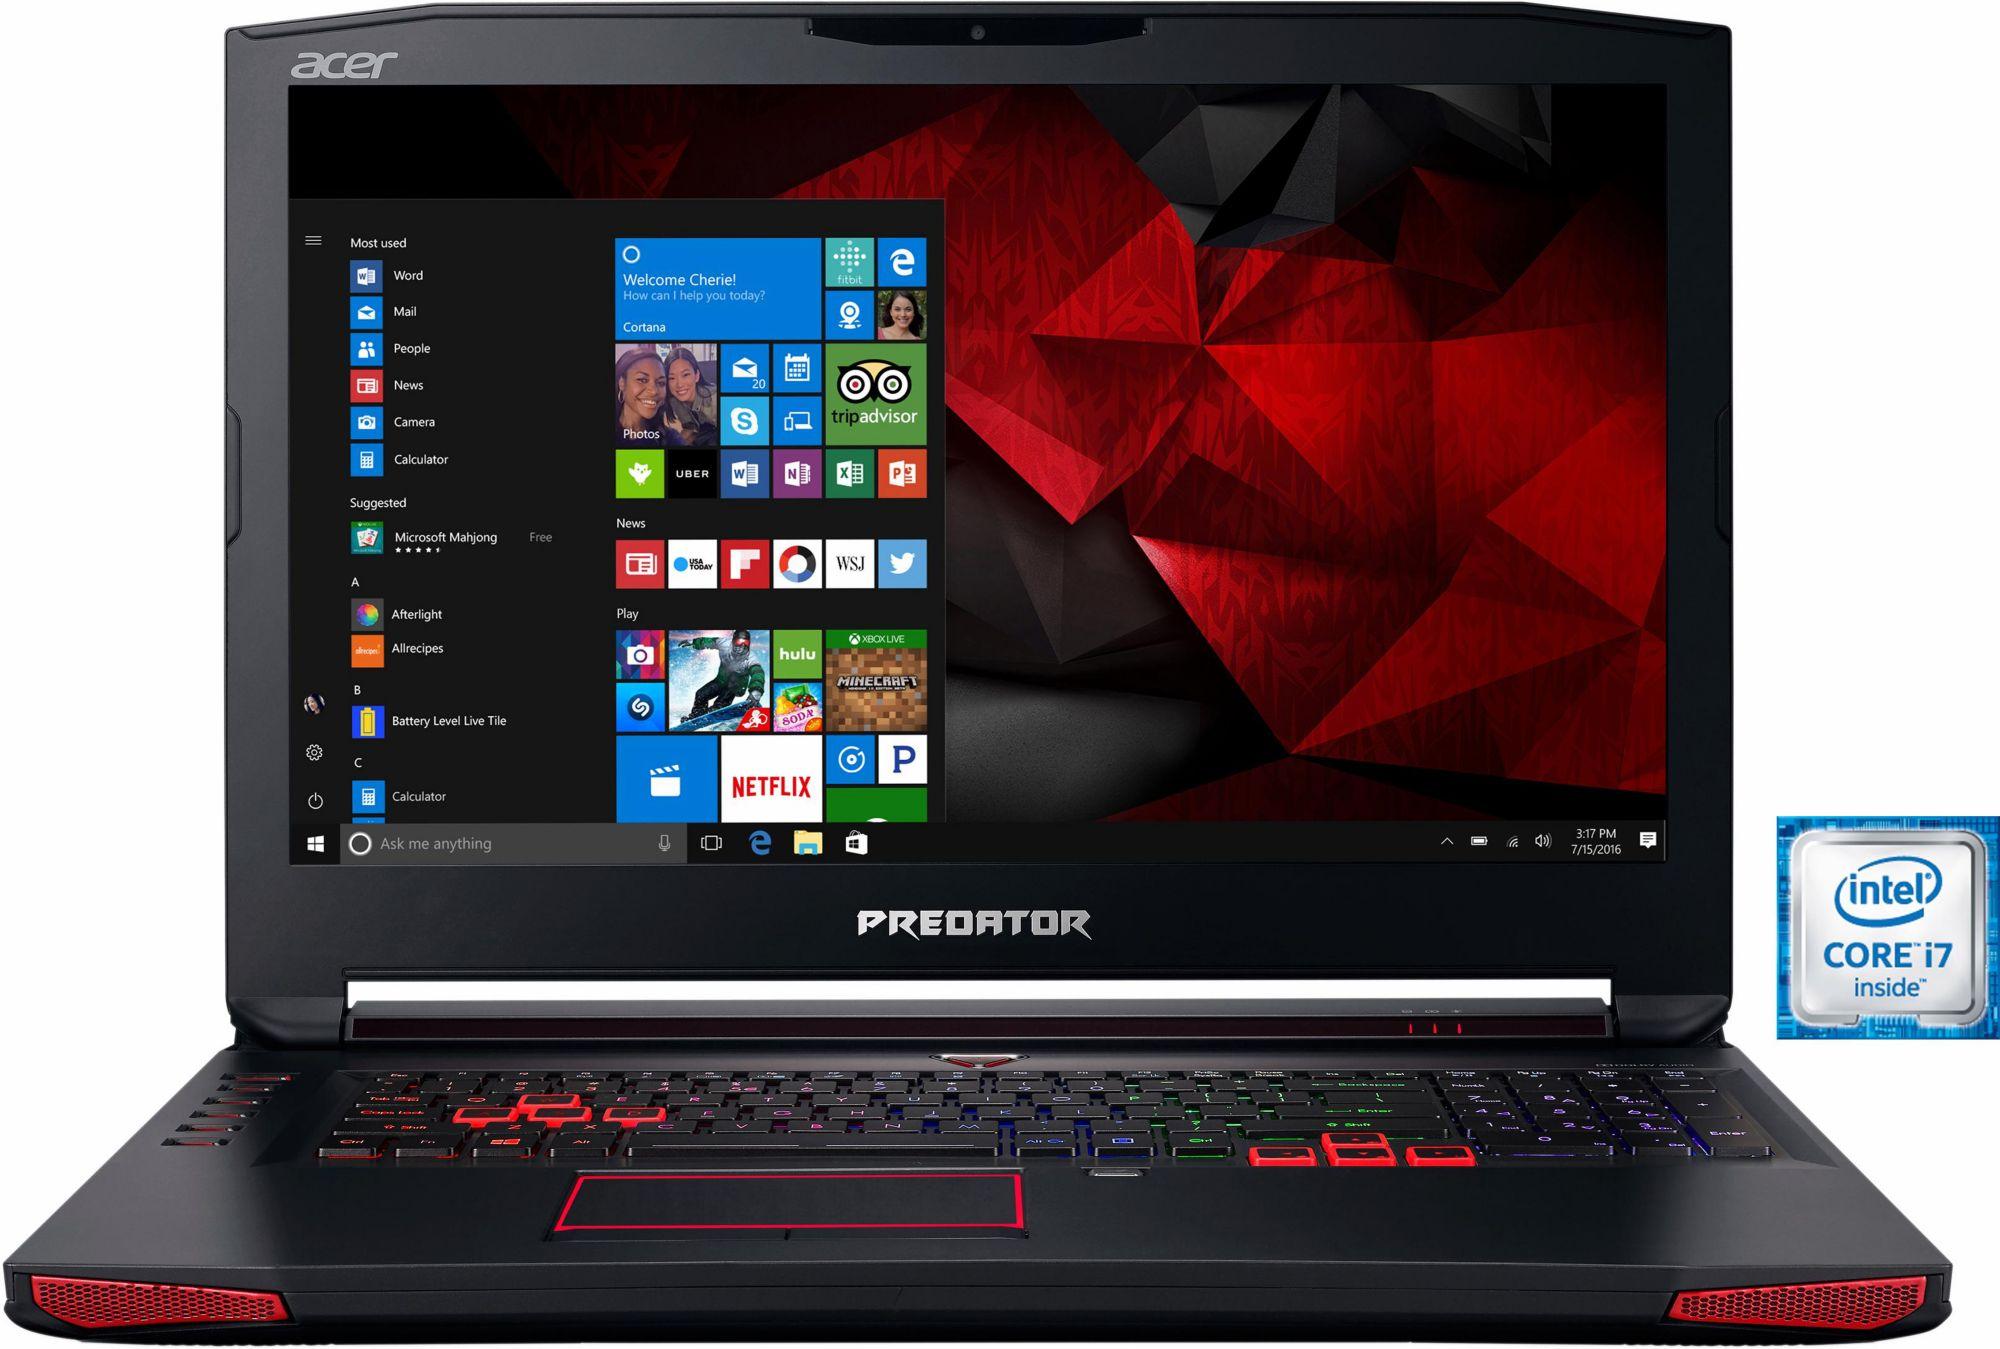 ACER Acer Predator G9-793-70PJ Notebook, Intel® Core? i7, 43,9 cm (17,3 Zoll), 1512 GB Speicher, 32768 MB